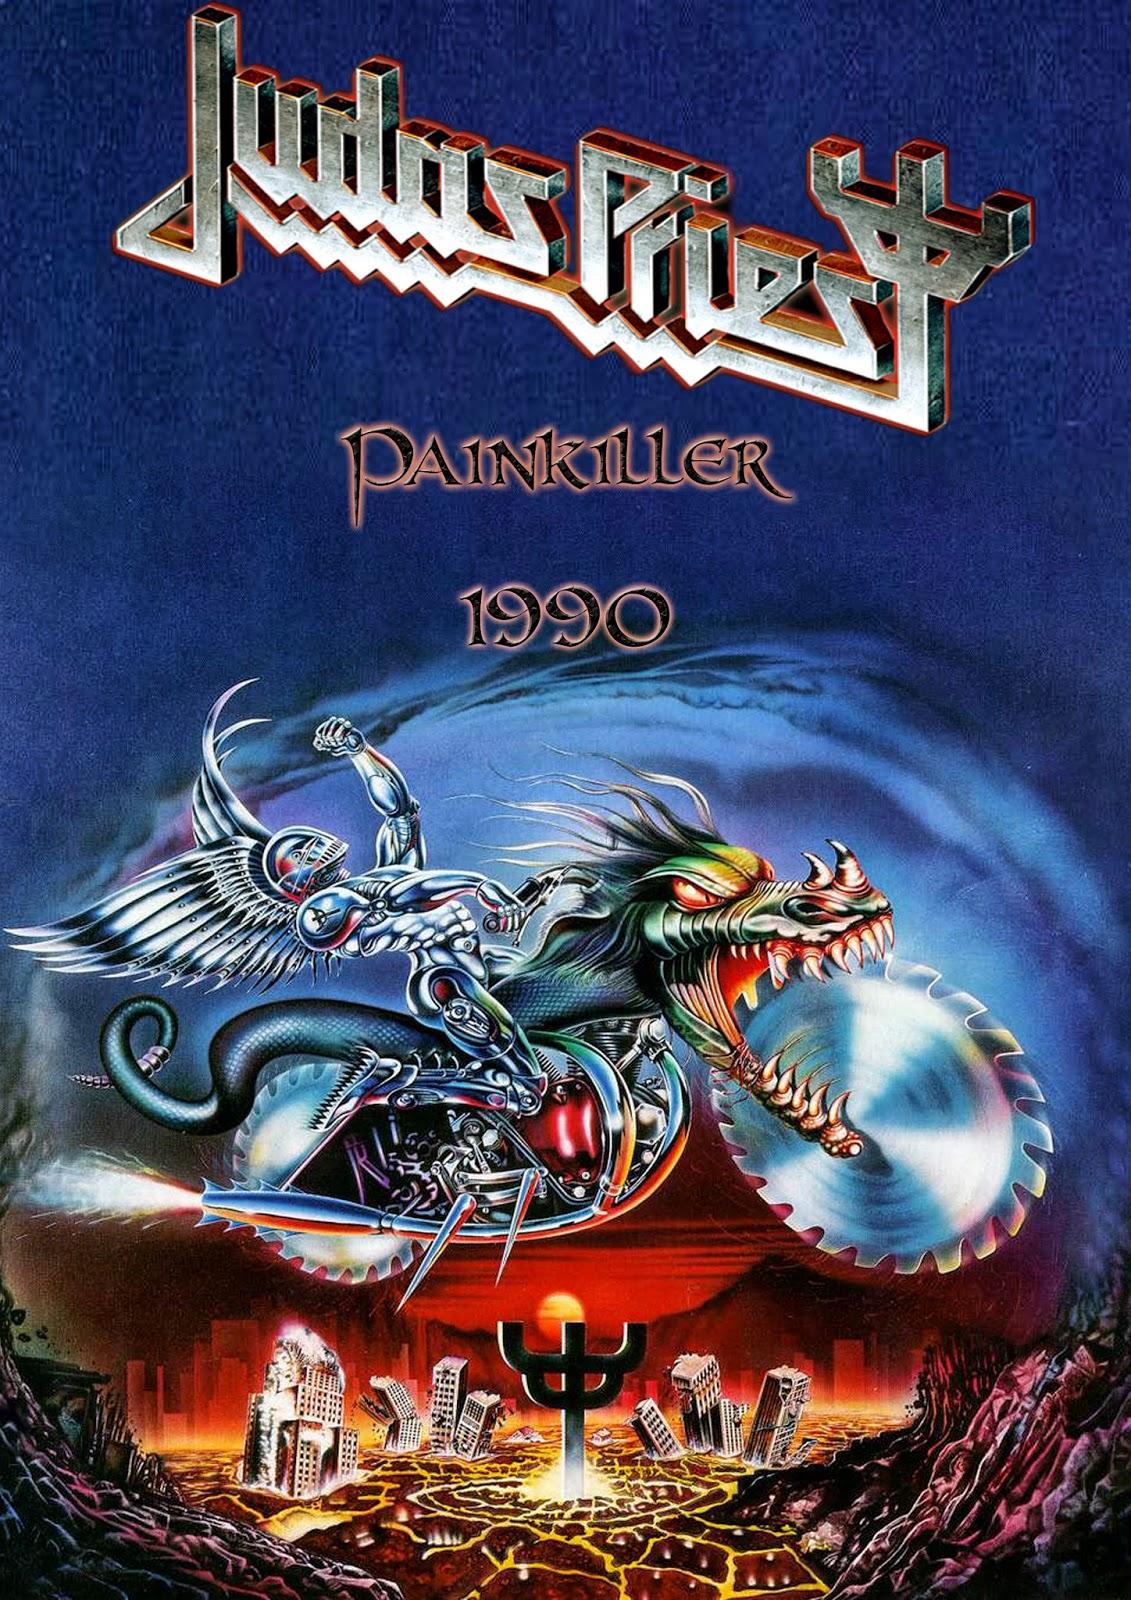 Metal Wallpaper Nash Judas Priest Painkiller